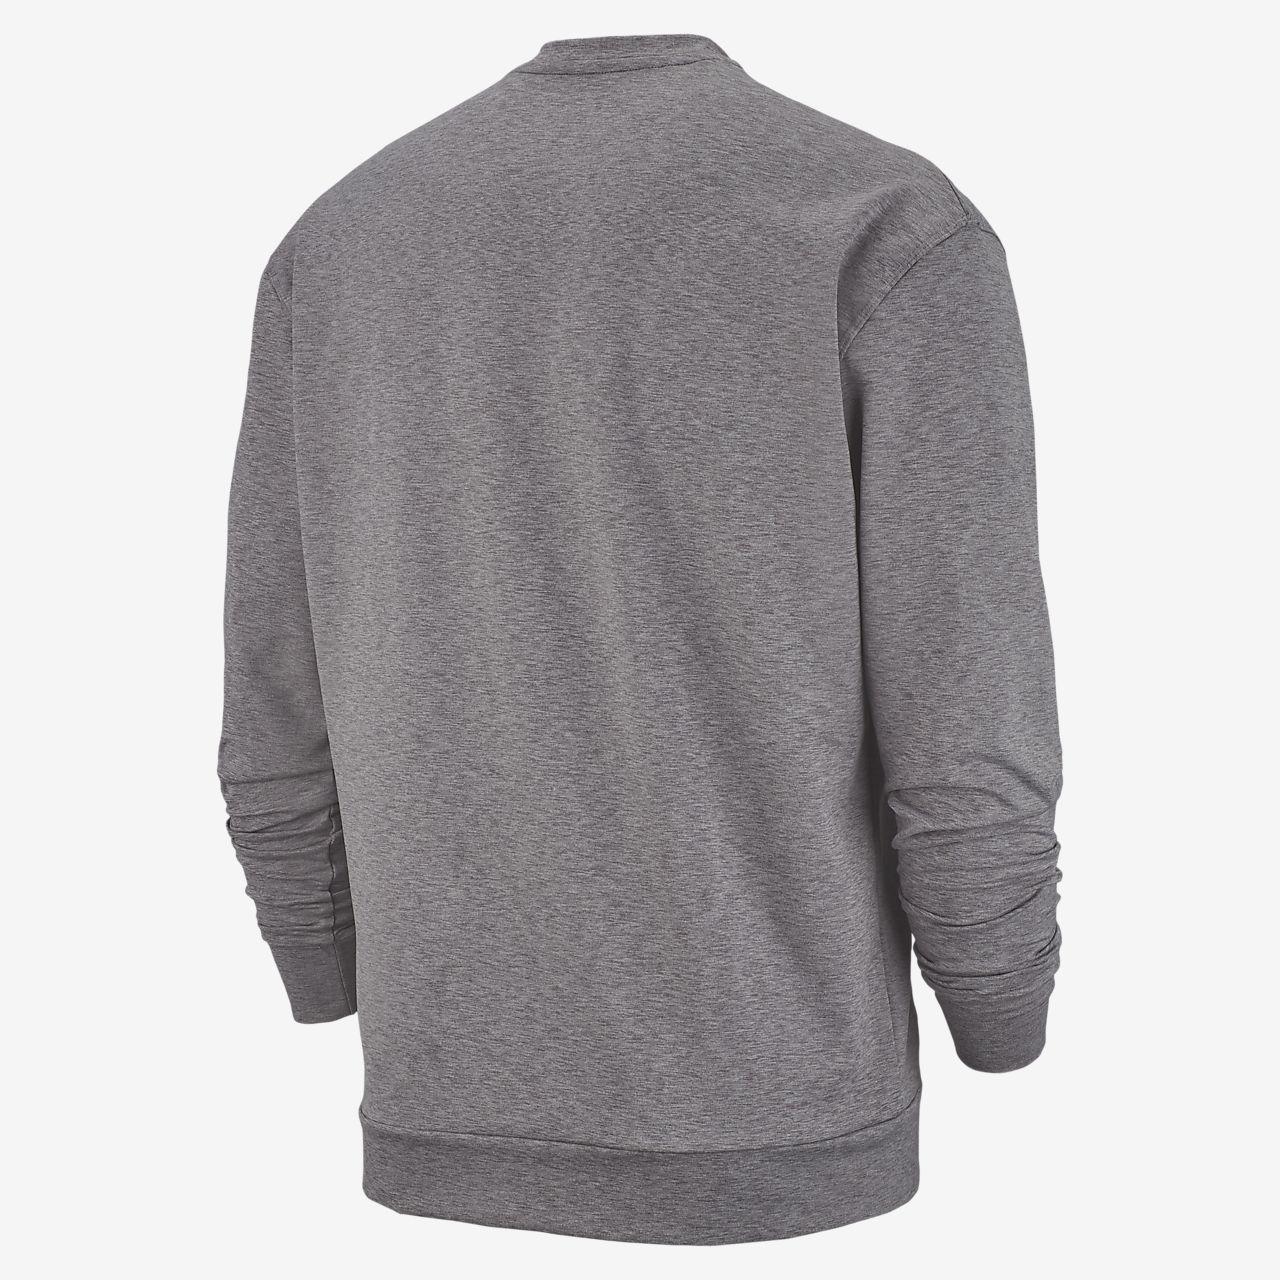 Camisola de manga comprida Nike Yoga Dri FIT para homem